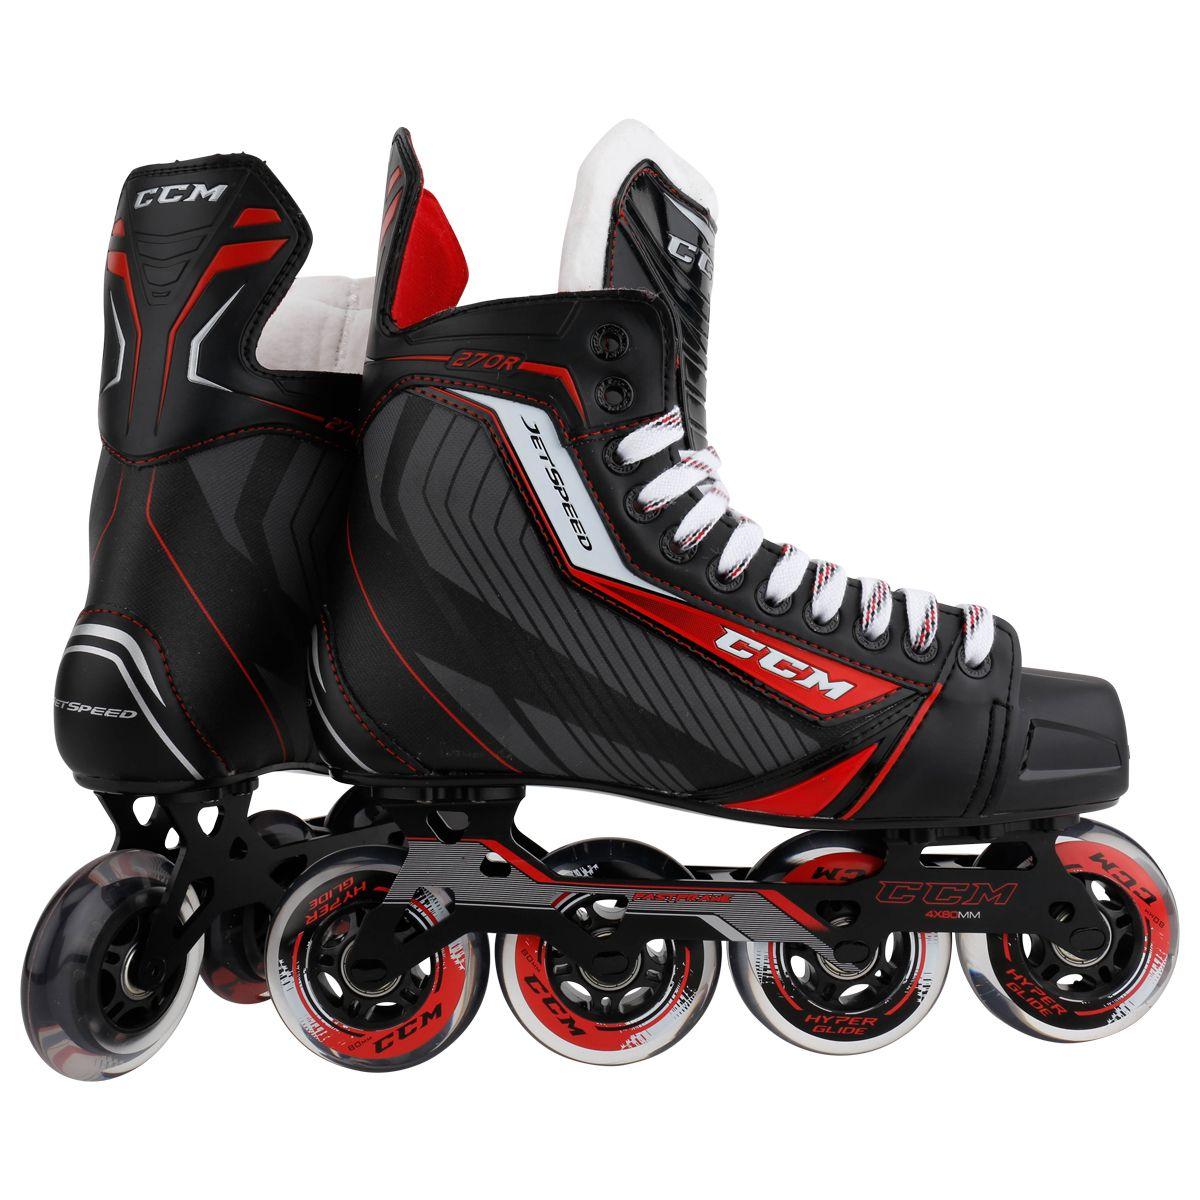 Ccm Rbz 130 Le Sr Ice Hockey Pants W Stripe Roller Hockey Skates Roller Skates Quad Roller Skates